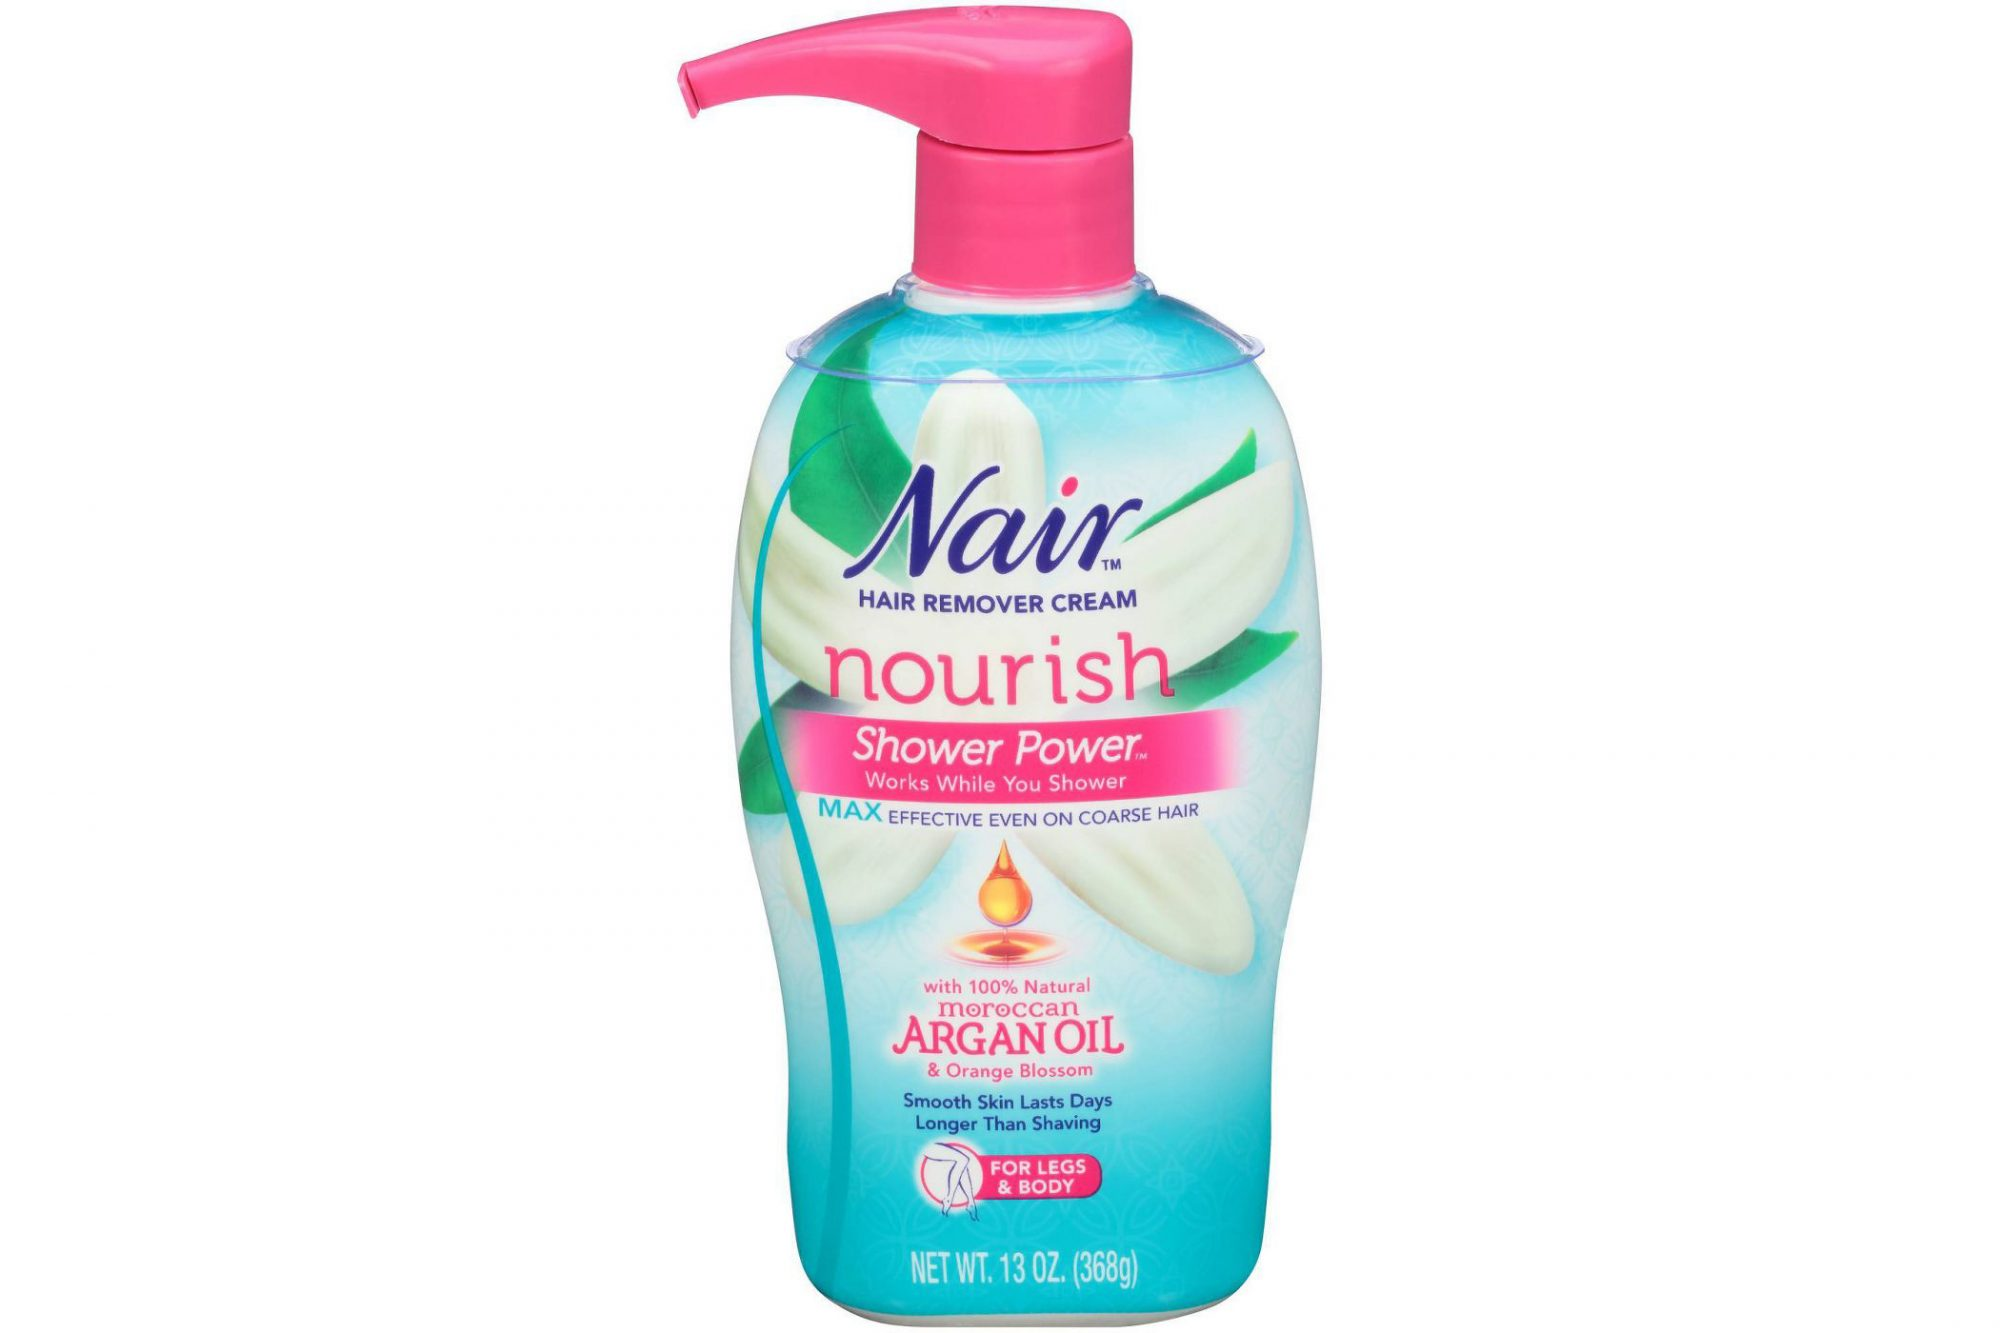 nair-shower-hair-removal-crean.jpg